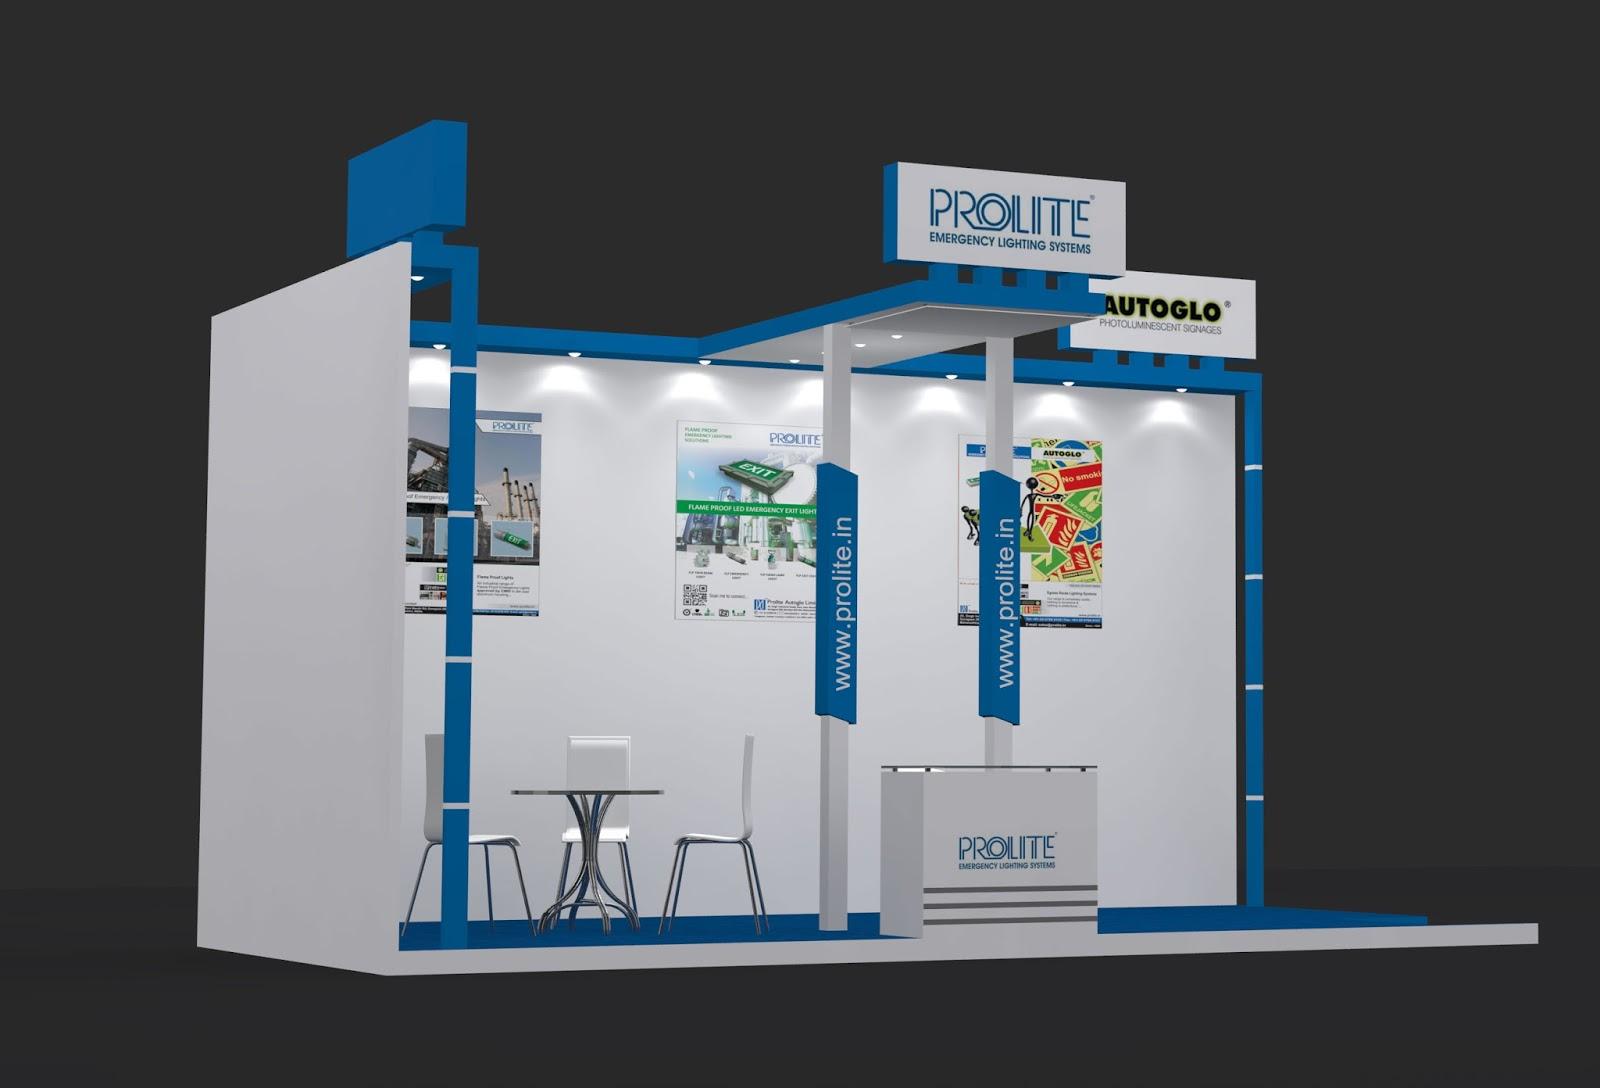 Saravanan designs prolite autoglo stall designs 4m x 3m for Kitchen designs 3m x 4m